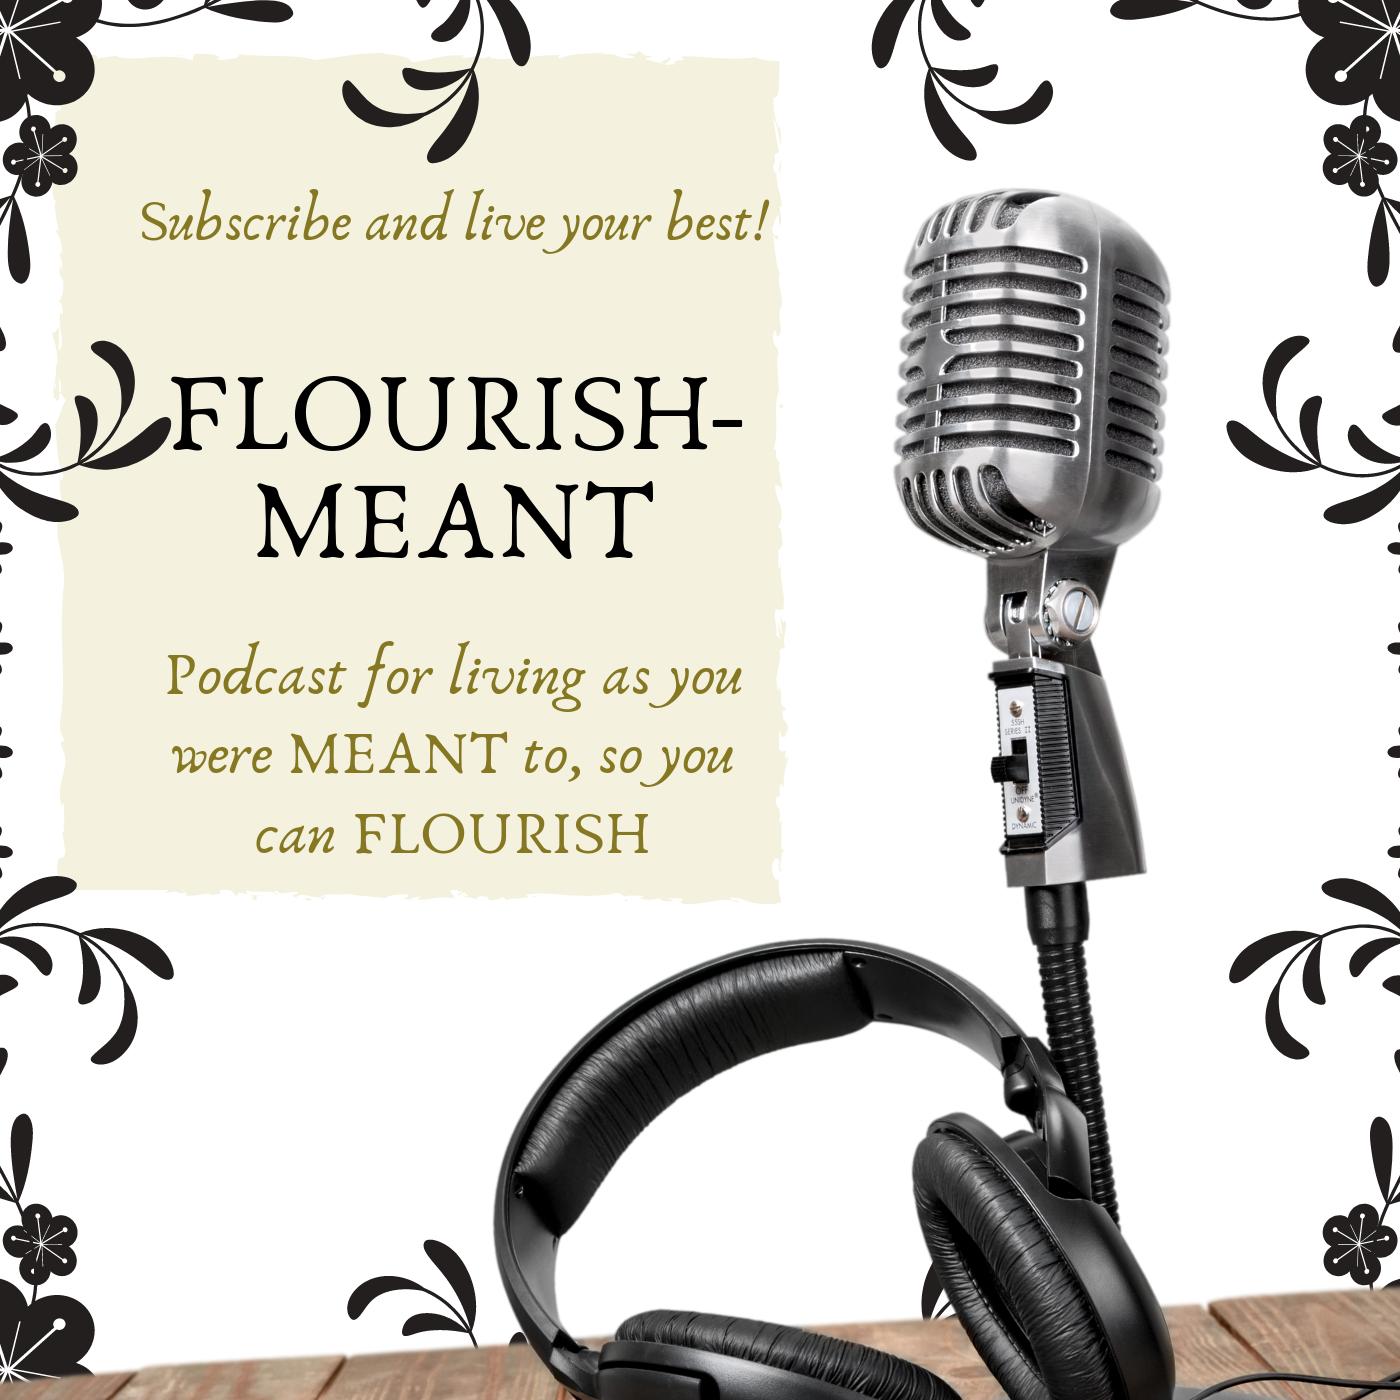 Flourish-Meant: You Were Meant to Live Abundantly show art